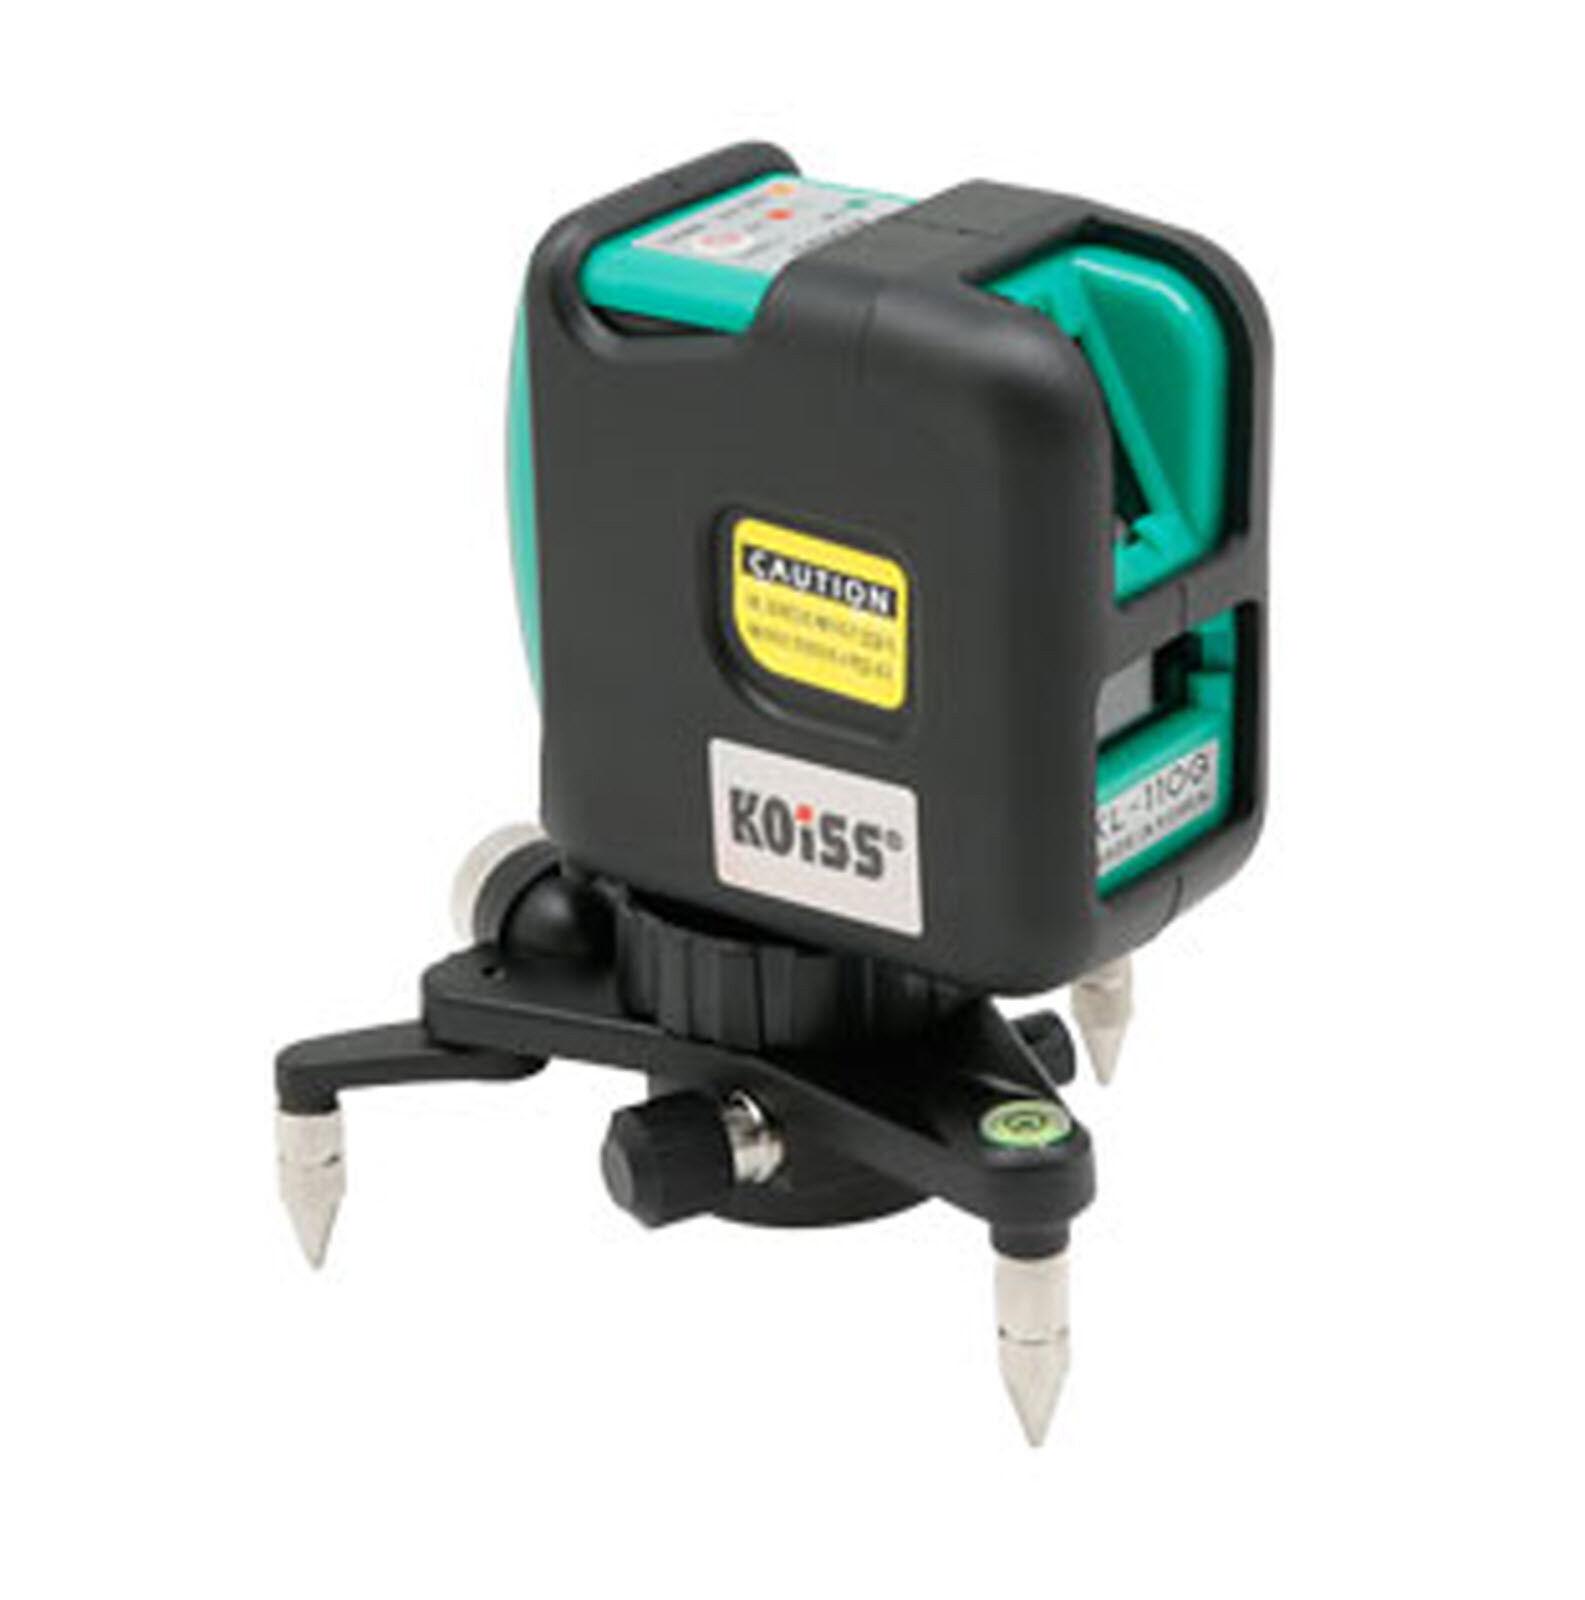 Koiss KL-110G Line Laser Level Portable Horizontal Grünical Measuring Tool